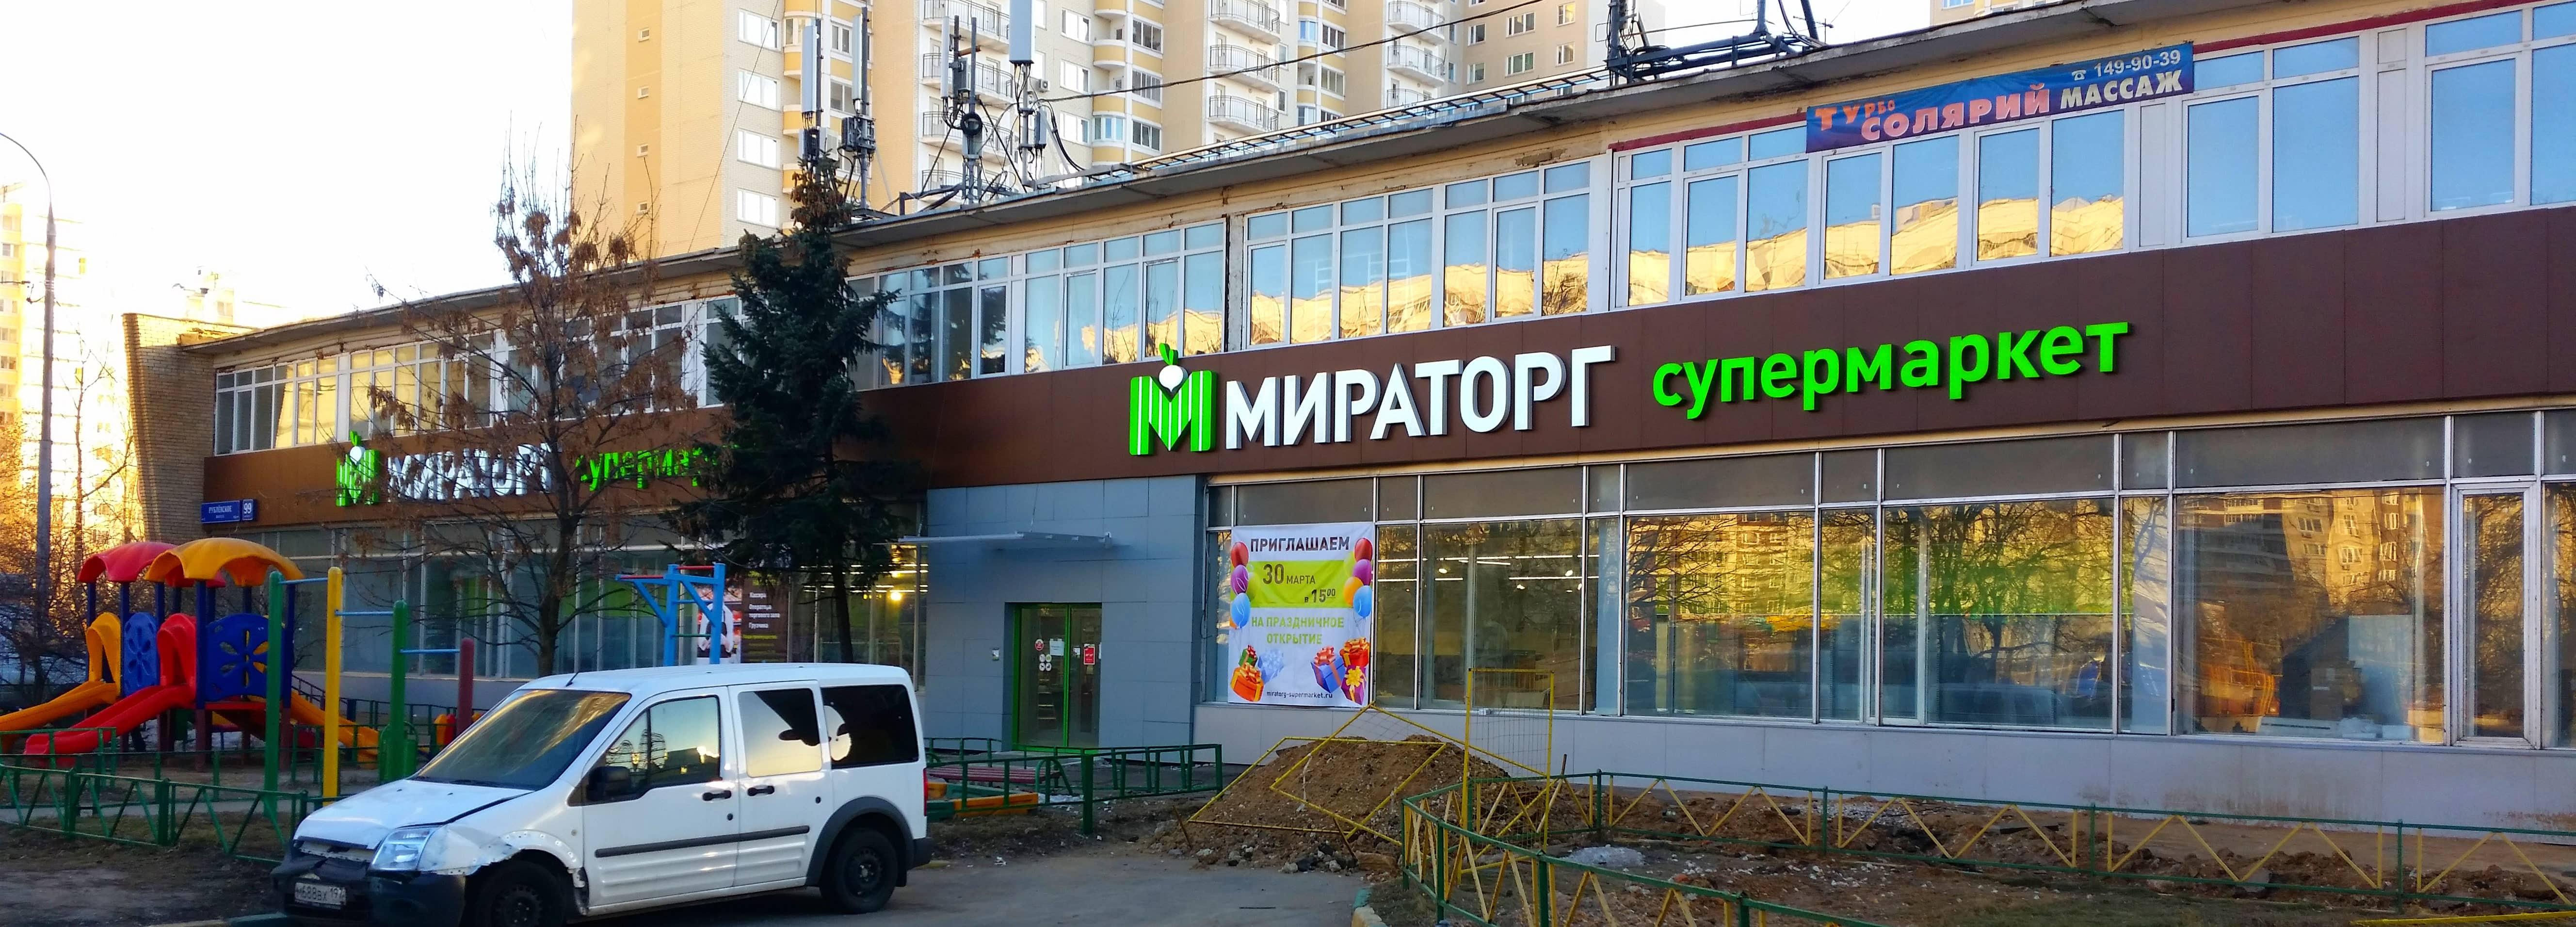 Narujnaia reklama rublevskoe-min